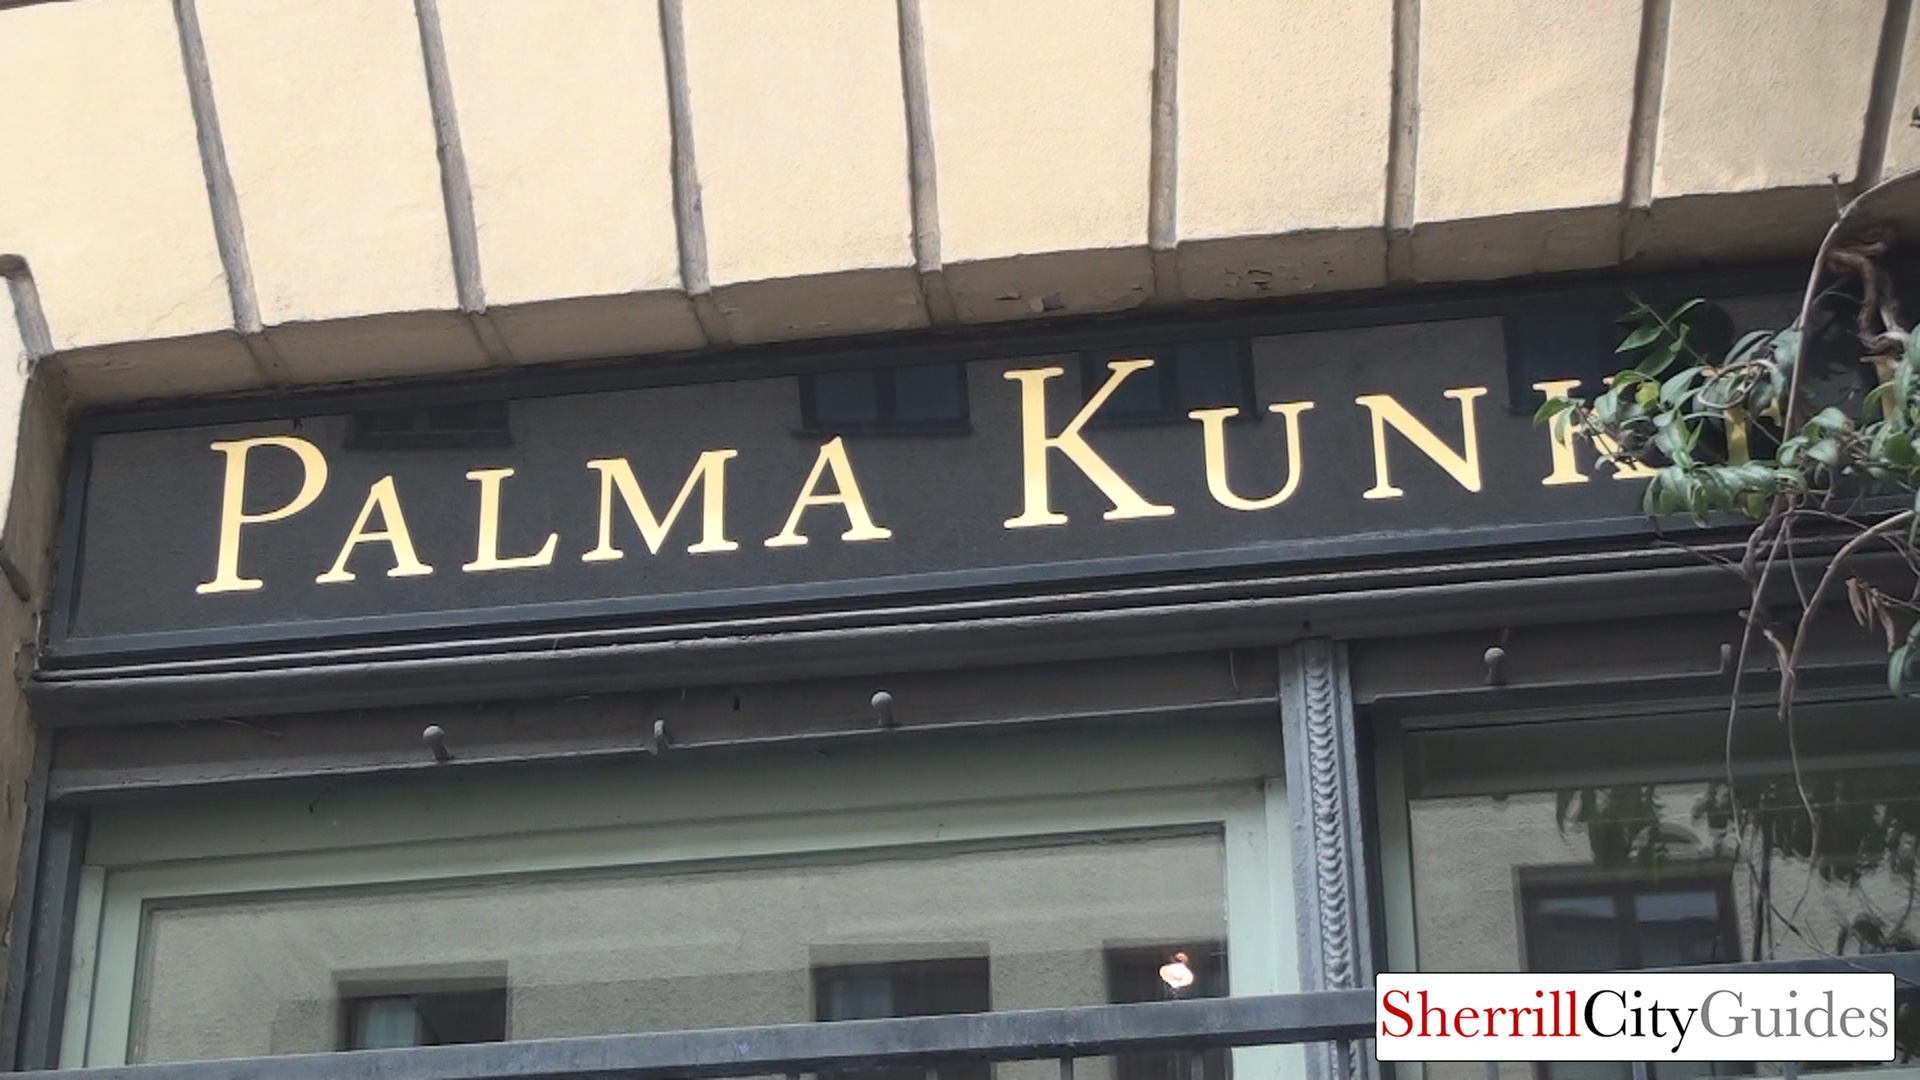 Palma Kunkel